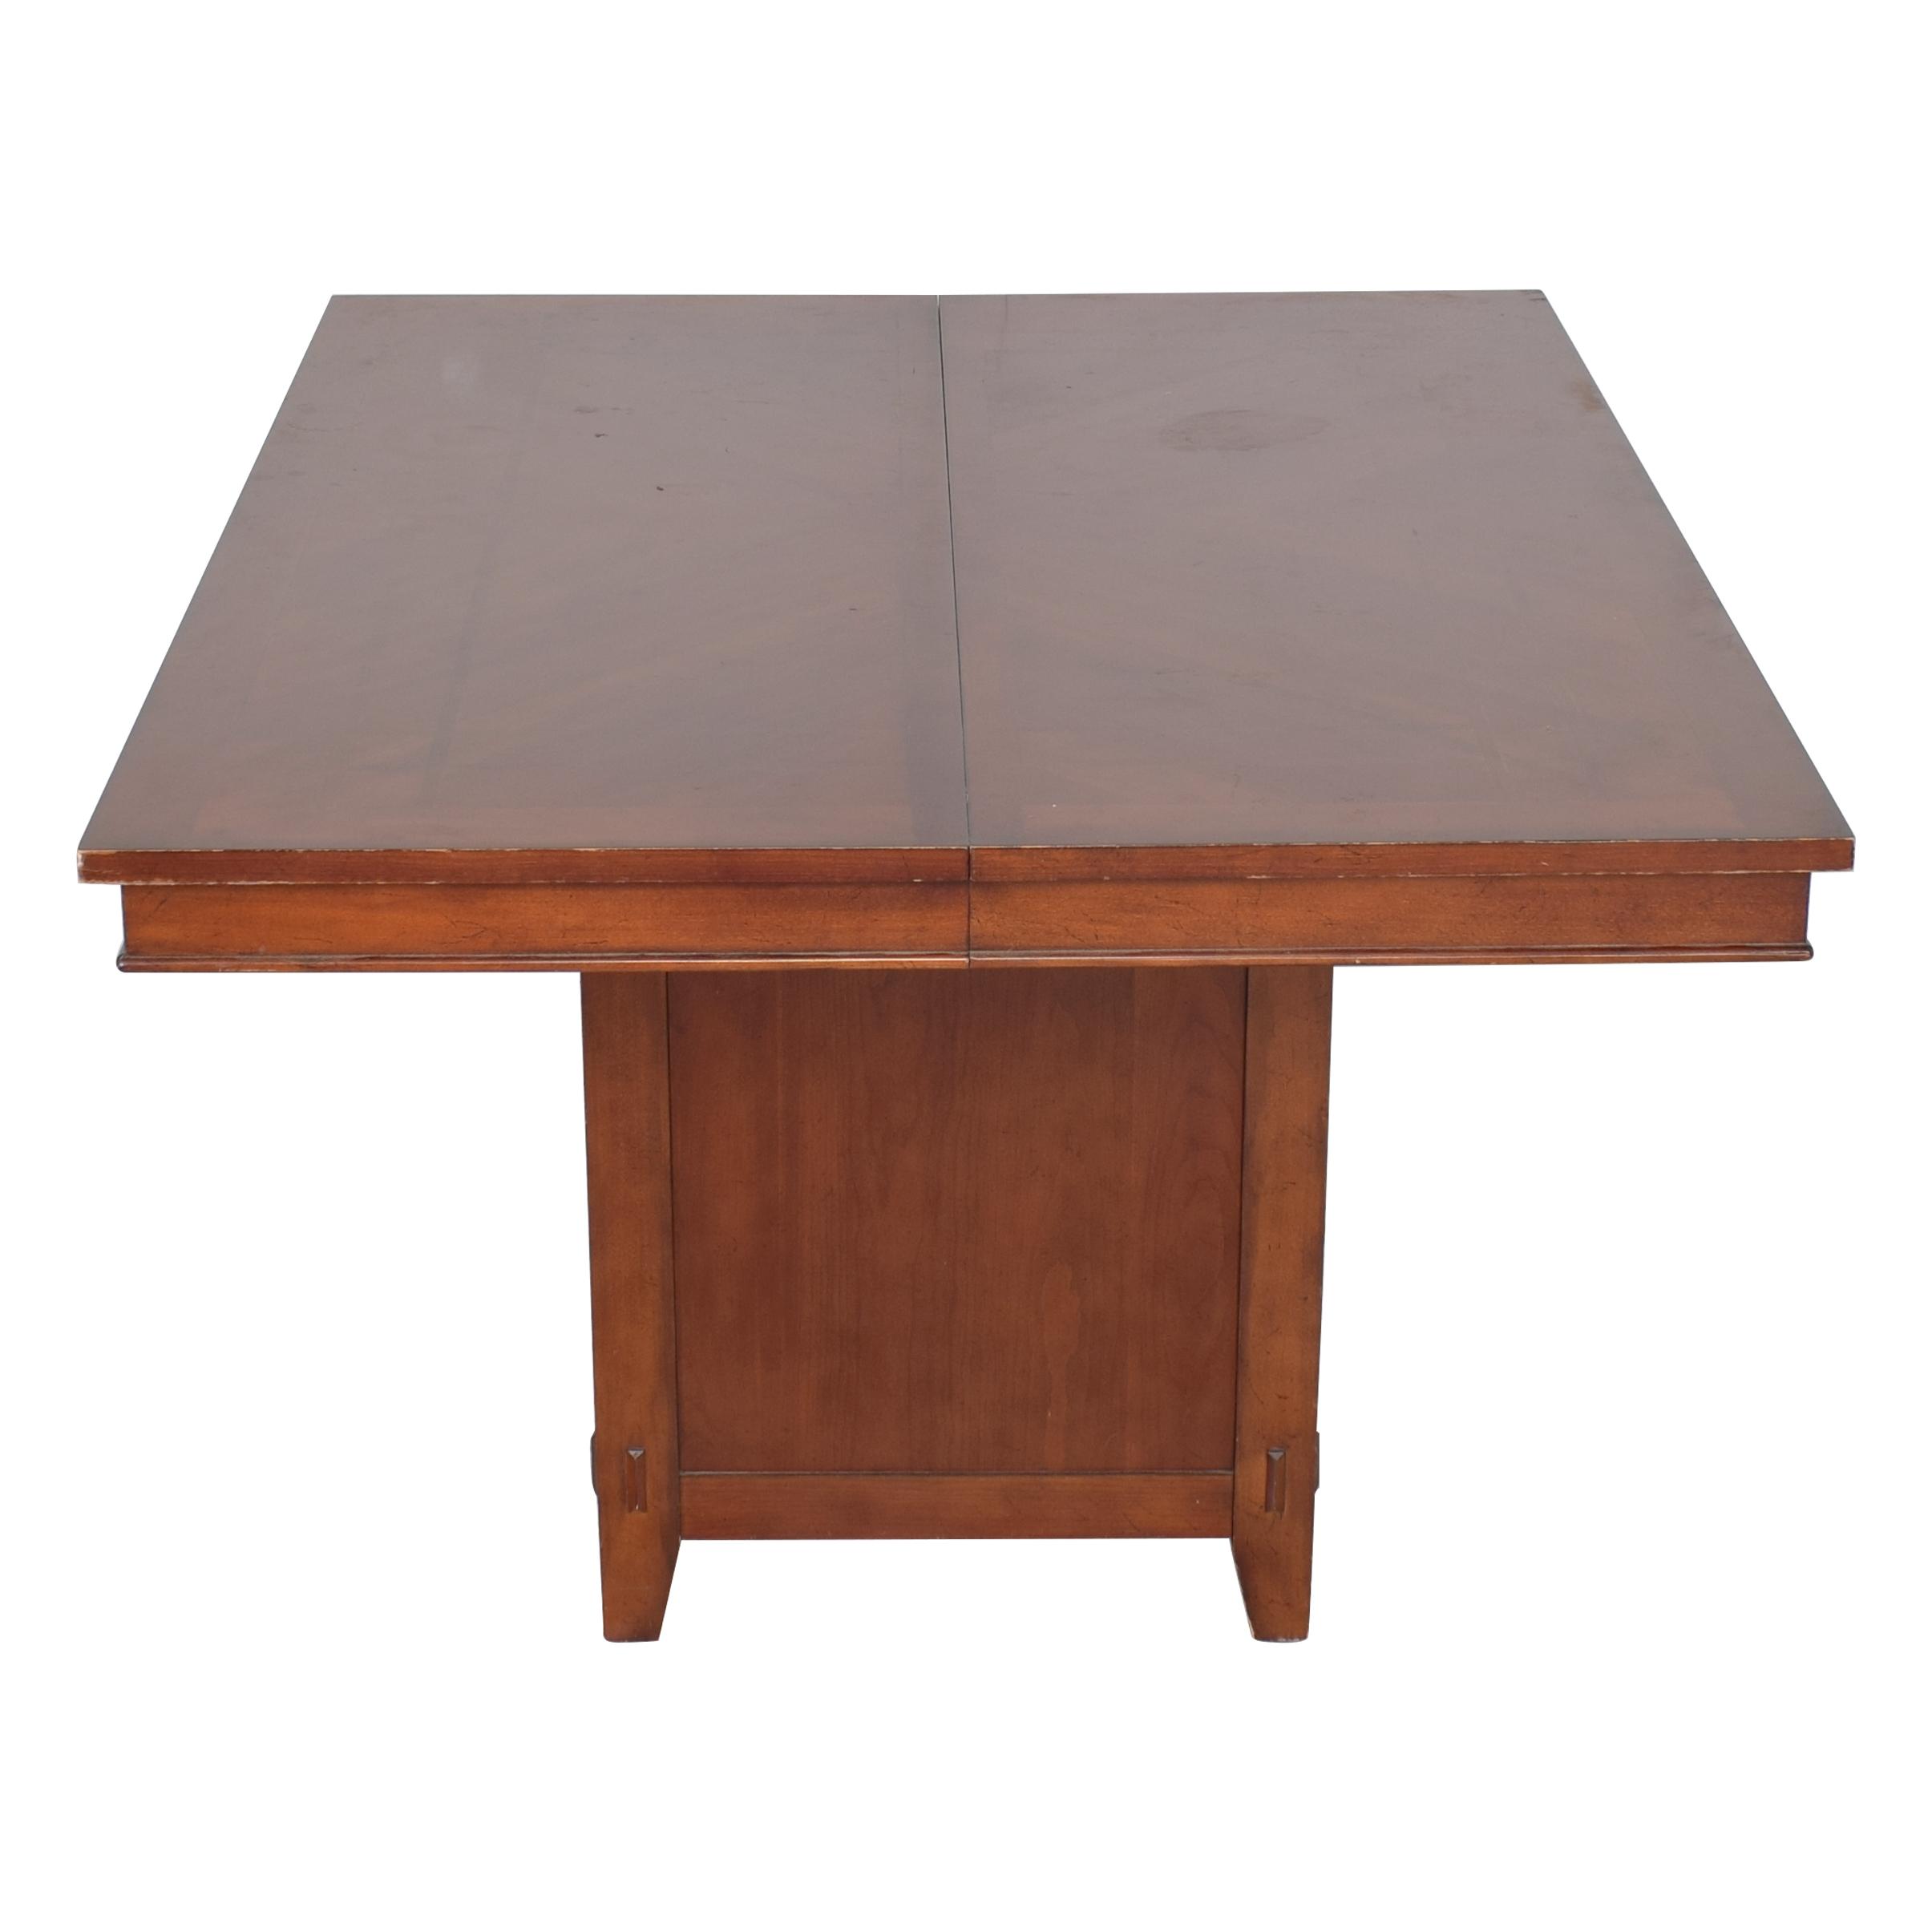 Broyhill Furniture Vantana Dining Table sale